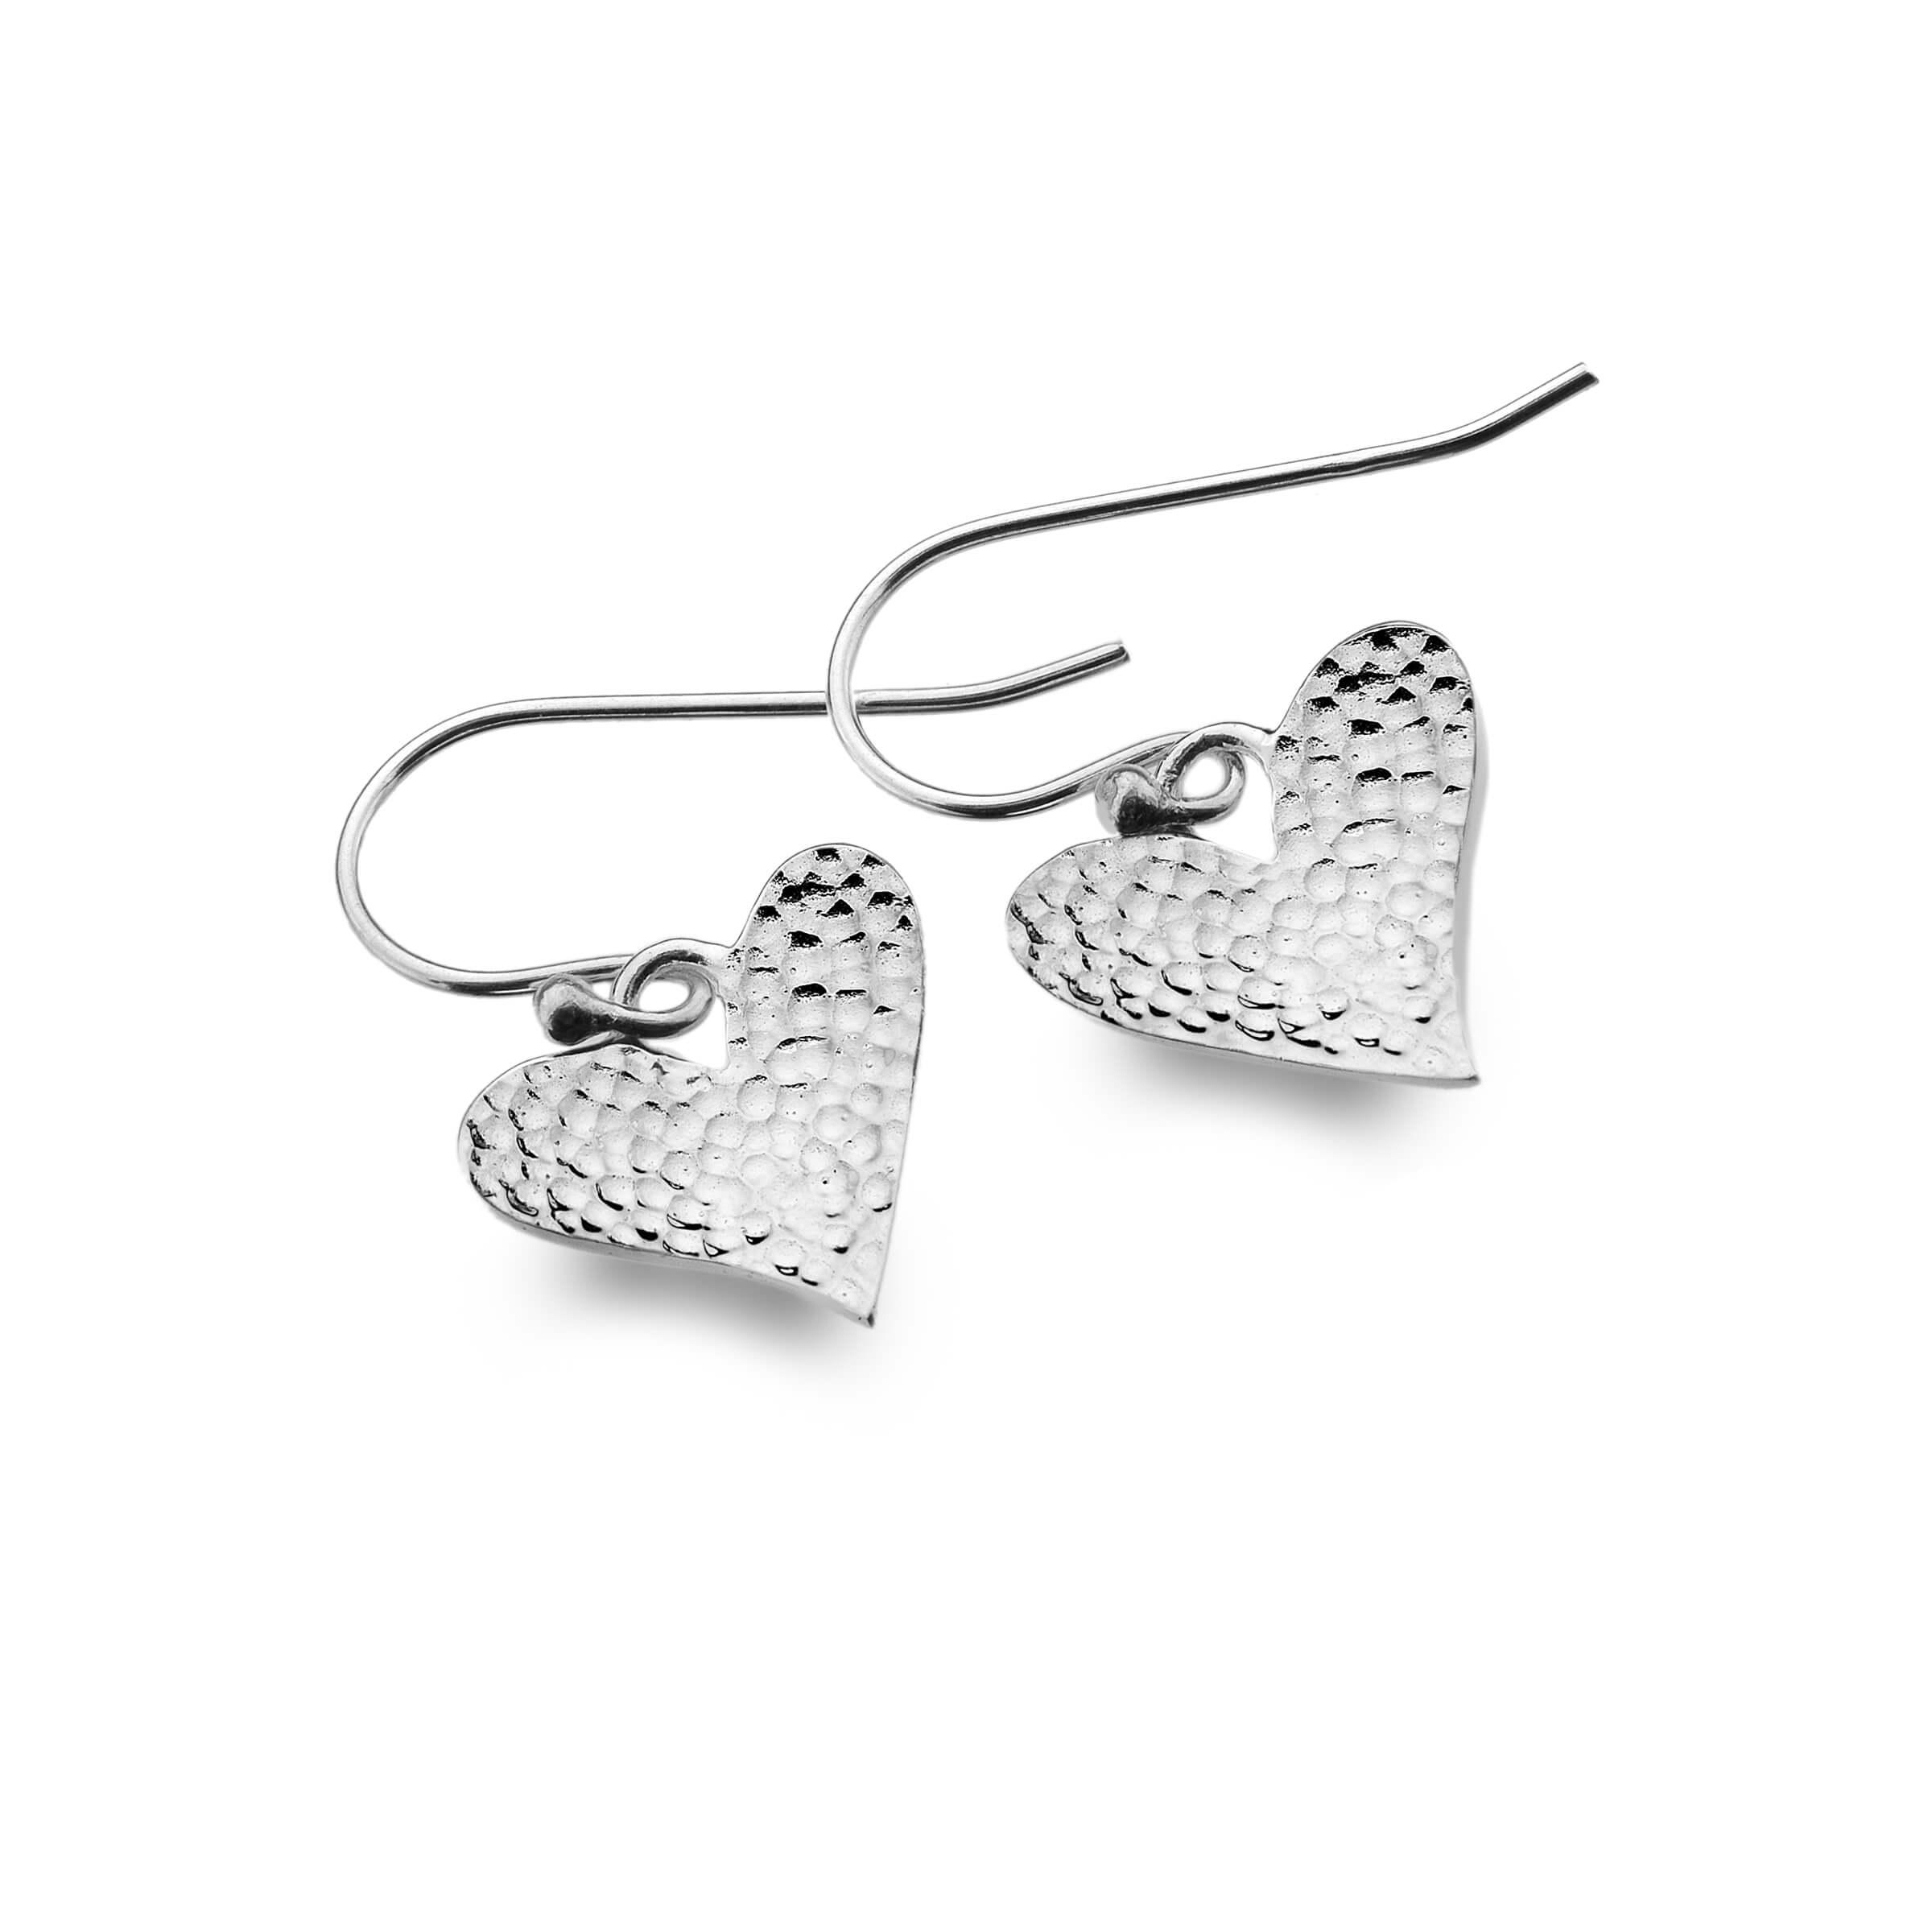 Hammered Love Heart Earrings